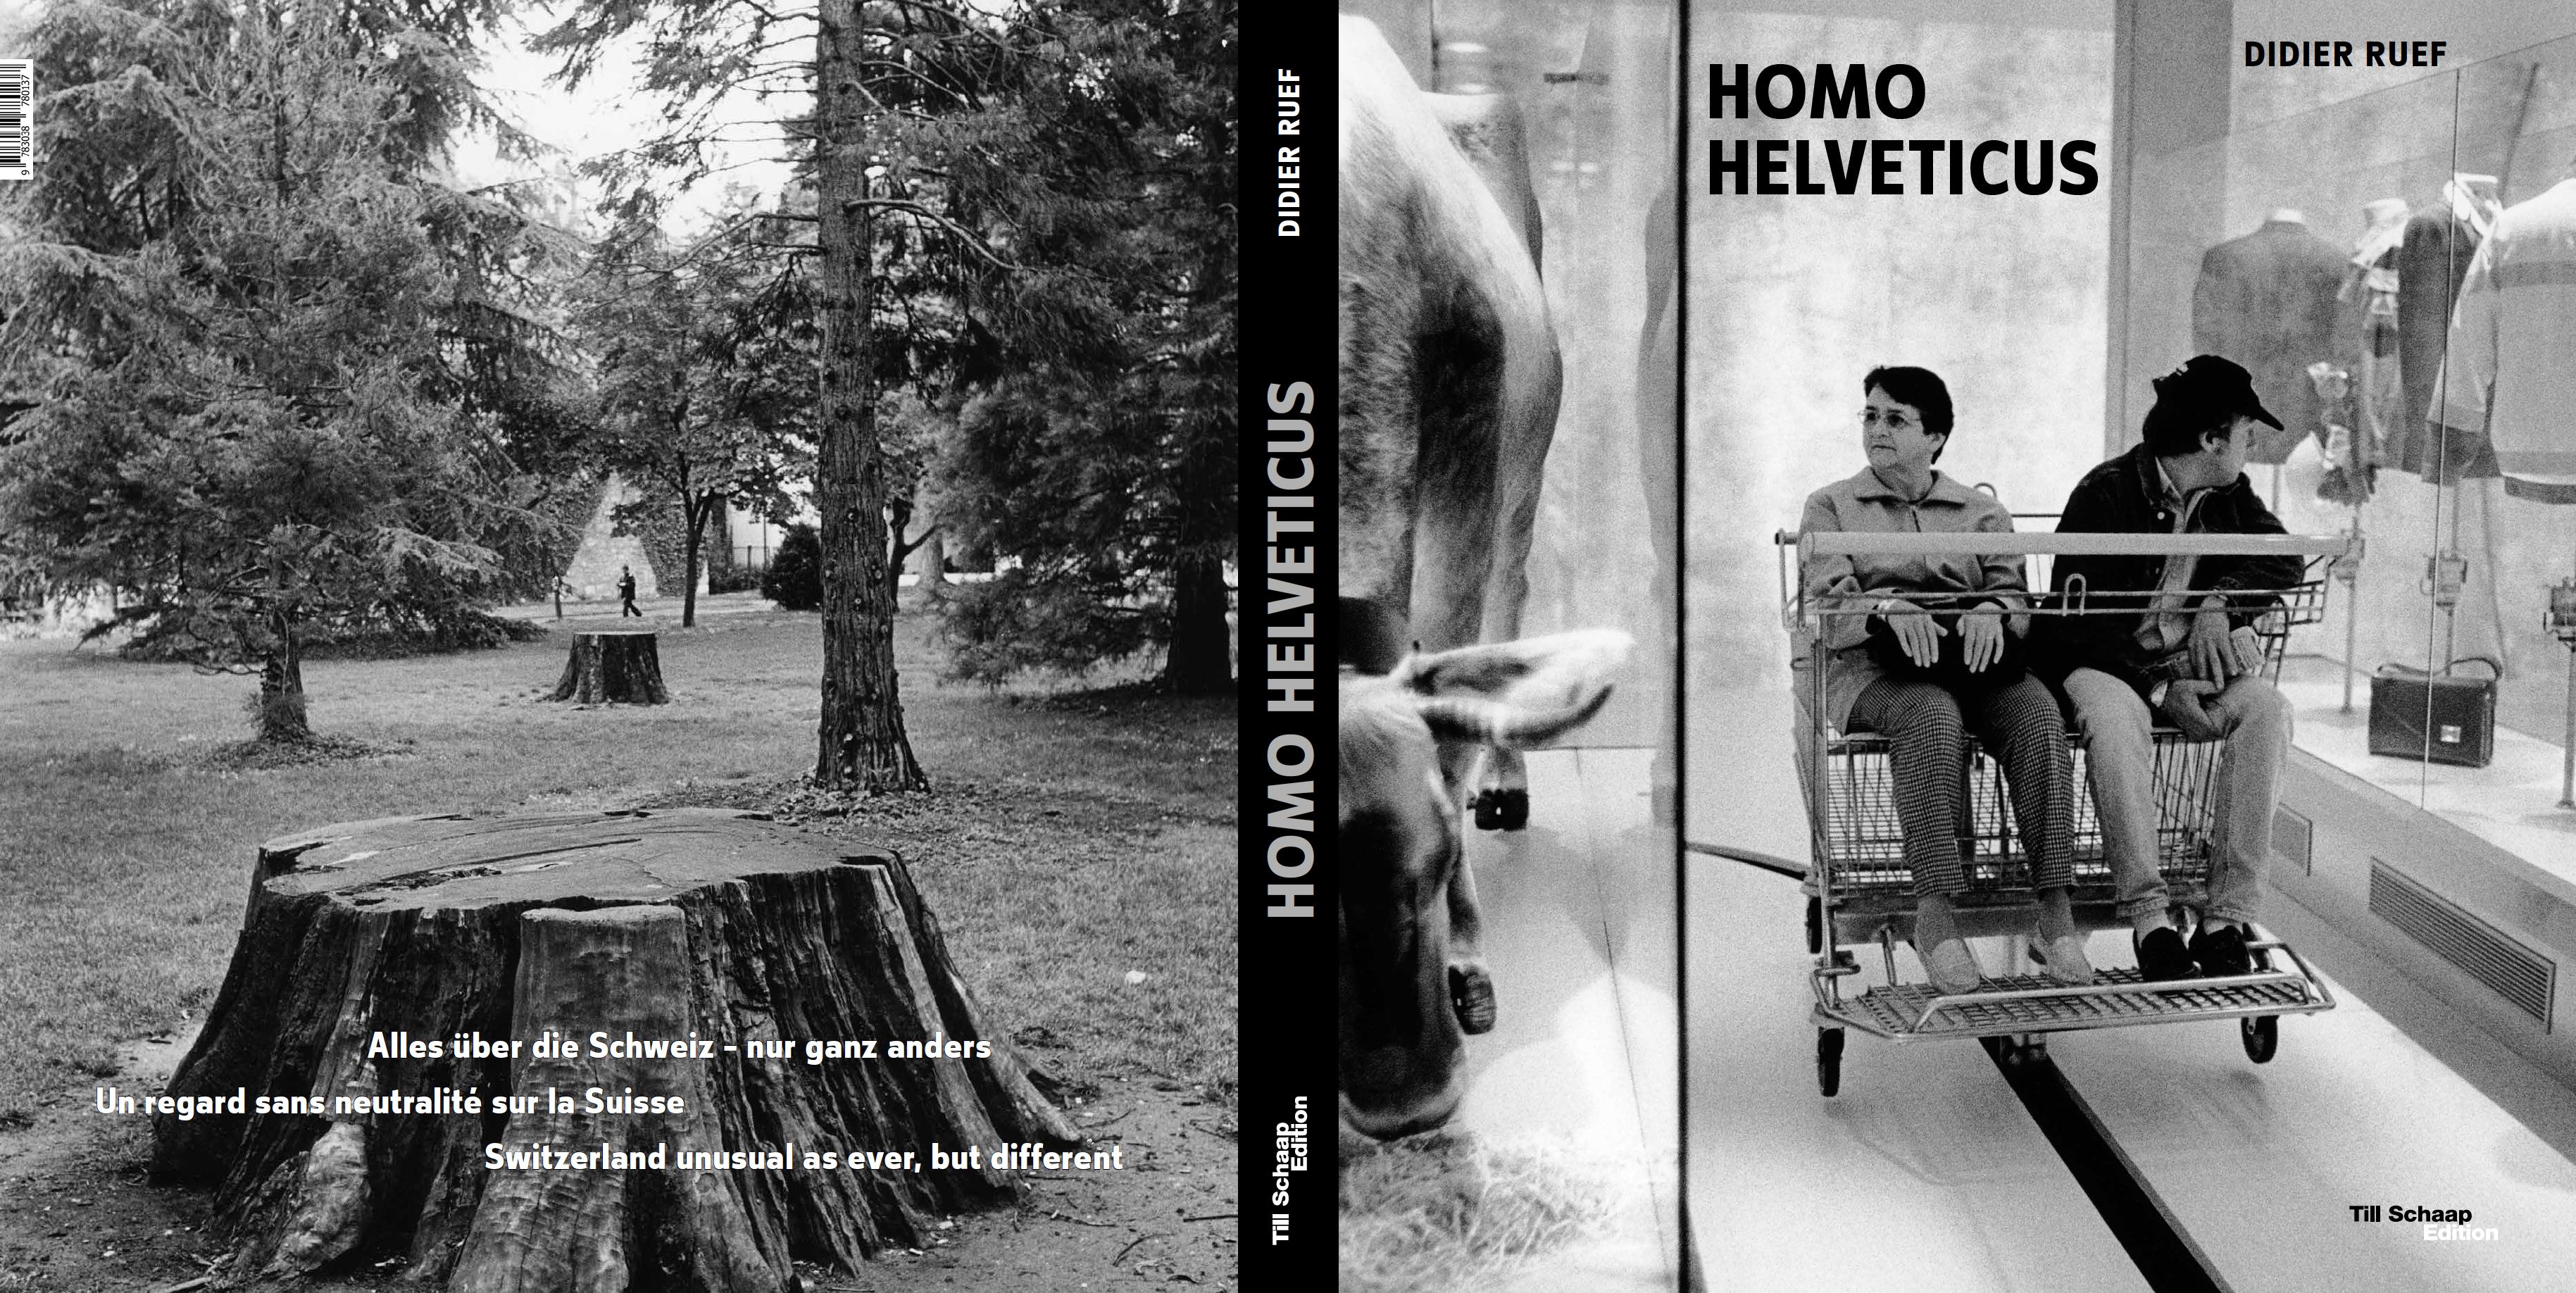 Homo Helveticus